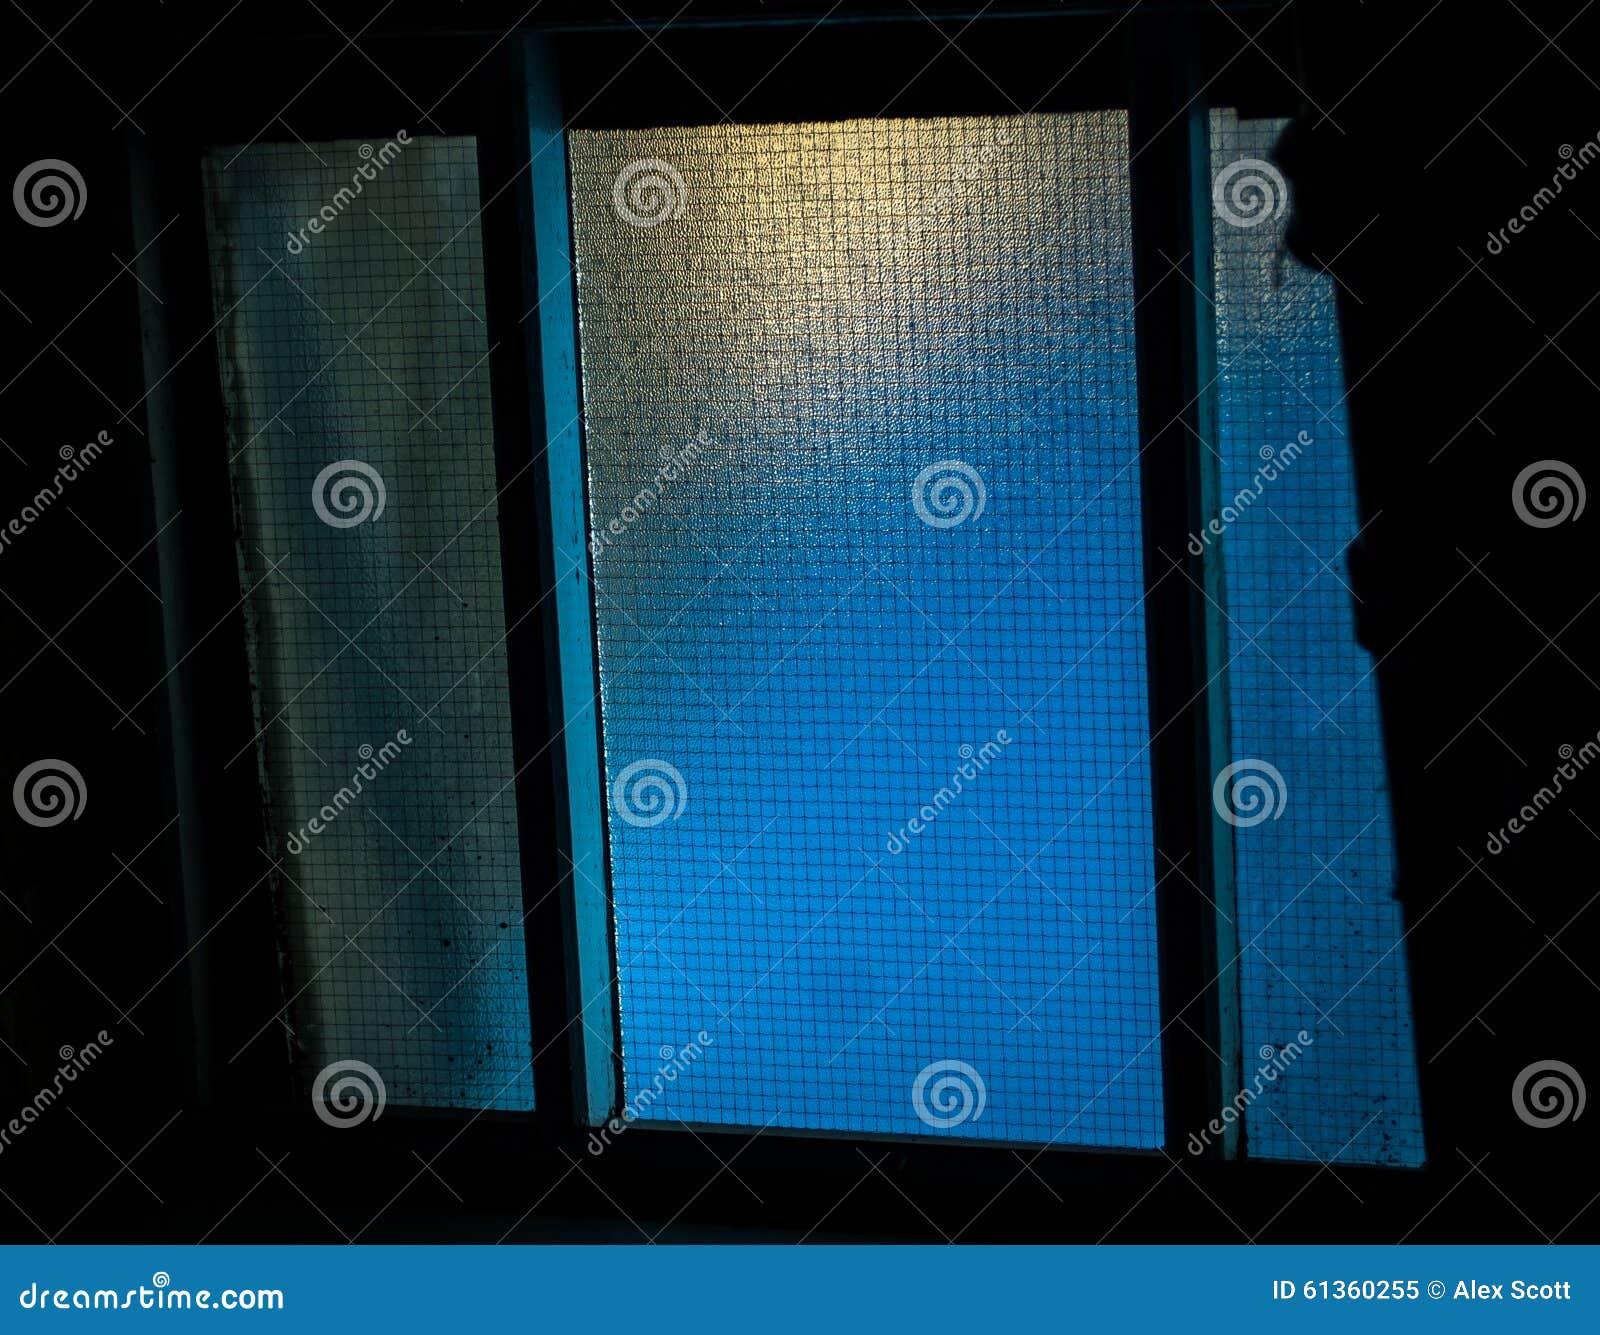 Open Window At Dusk: Ceiling Window At Dusk Stock Photo